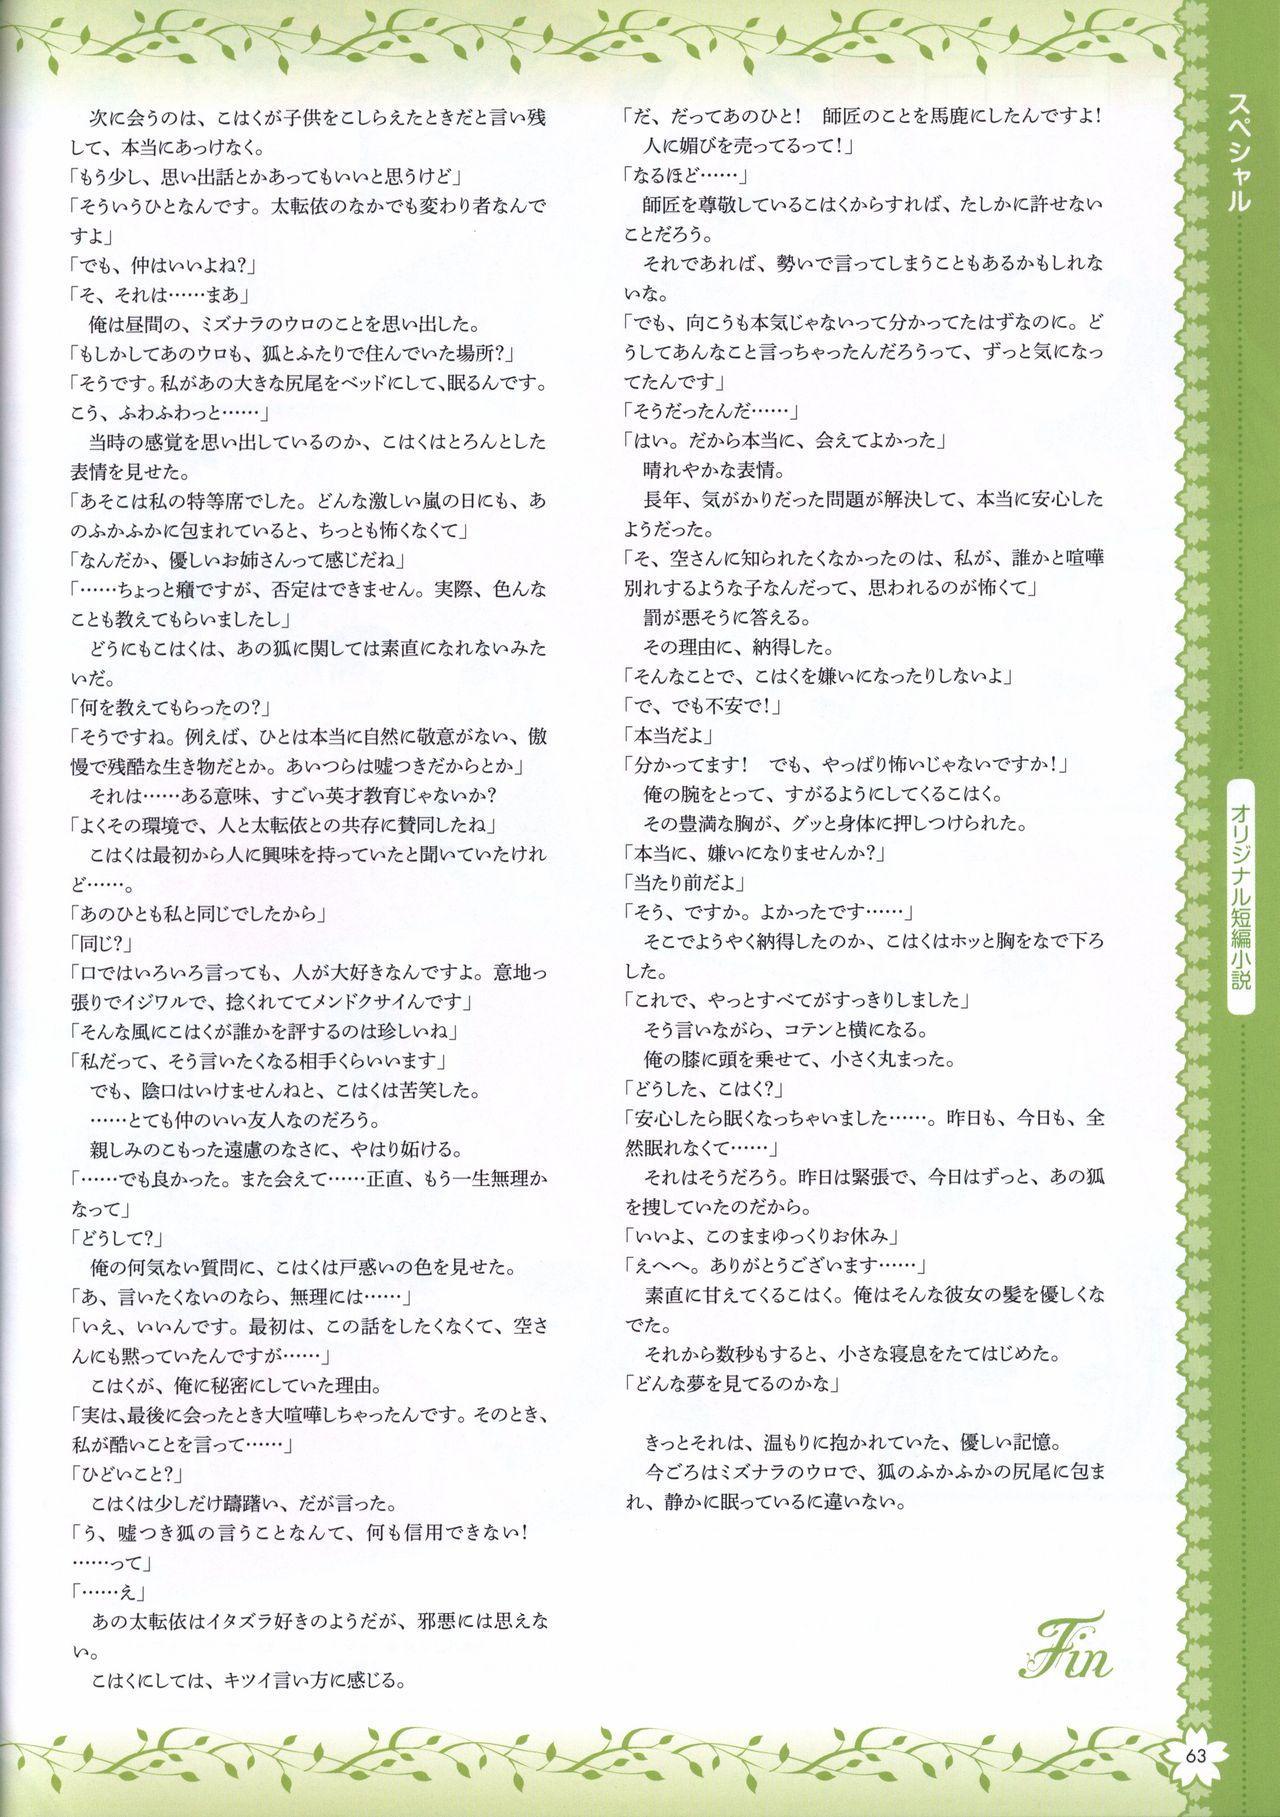 Tayutama2 Visual Art Fanbook 65